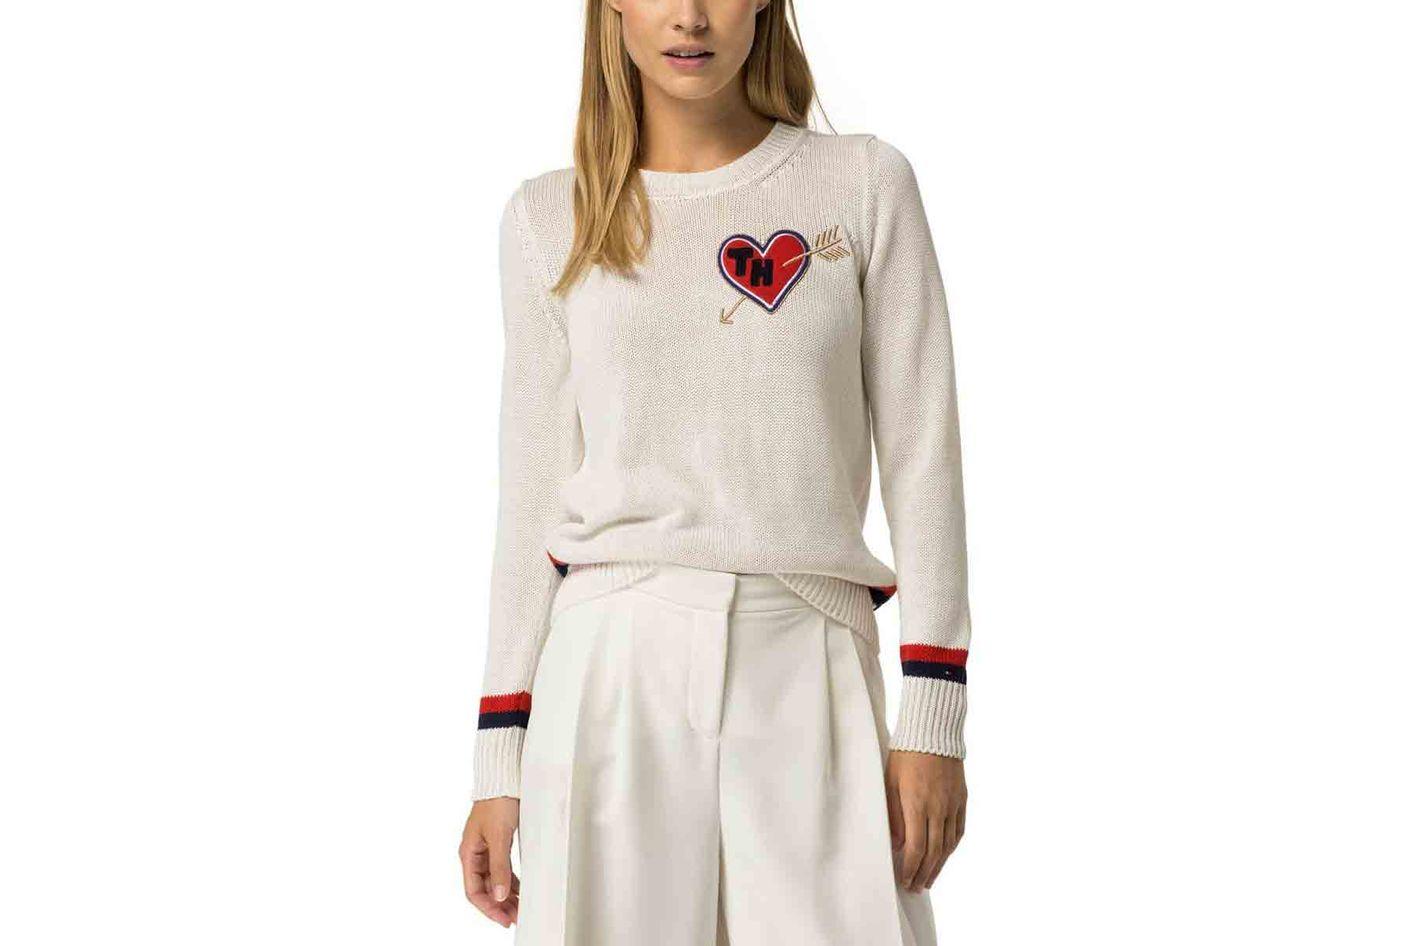 Tommy Hilfiger 'I Heart Tommy' Stripe Sweater